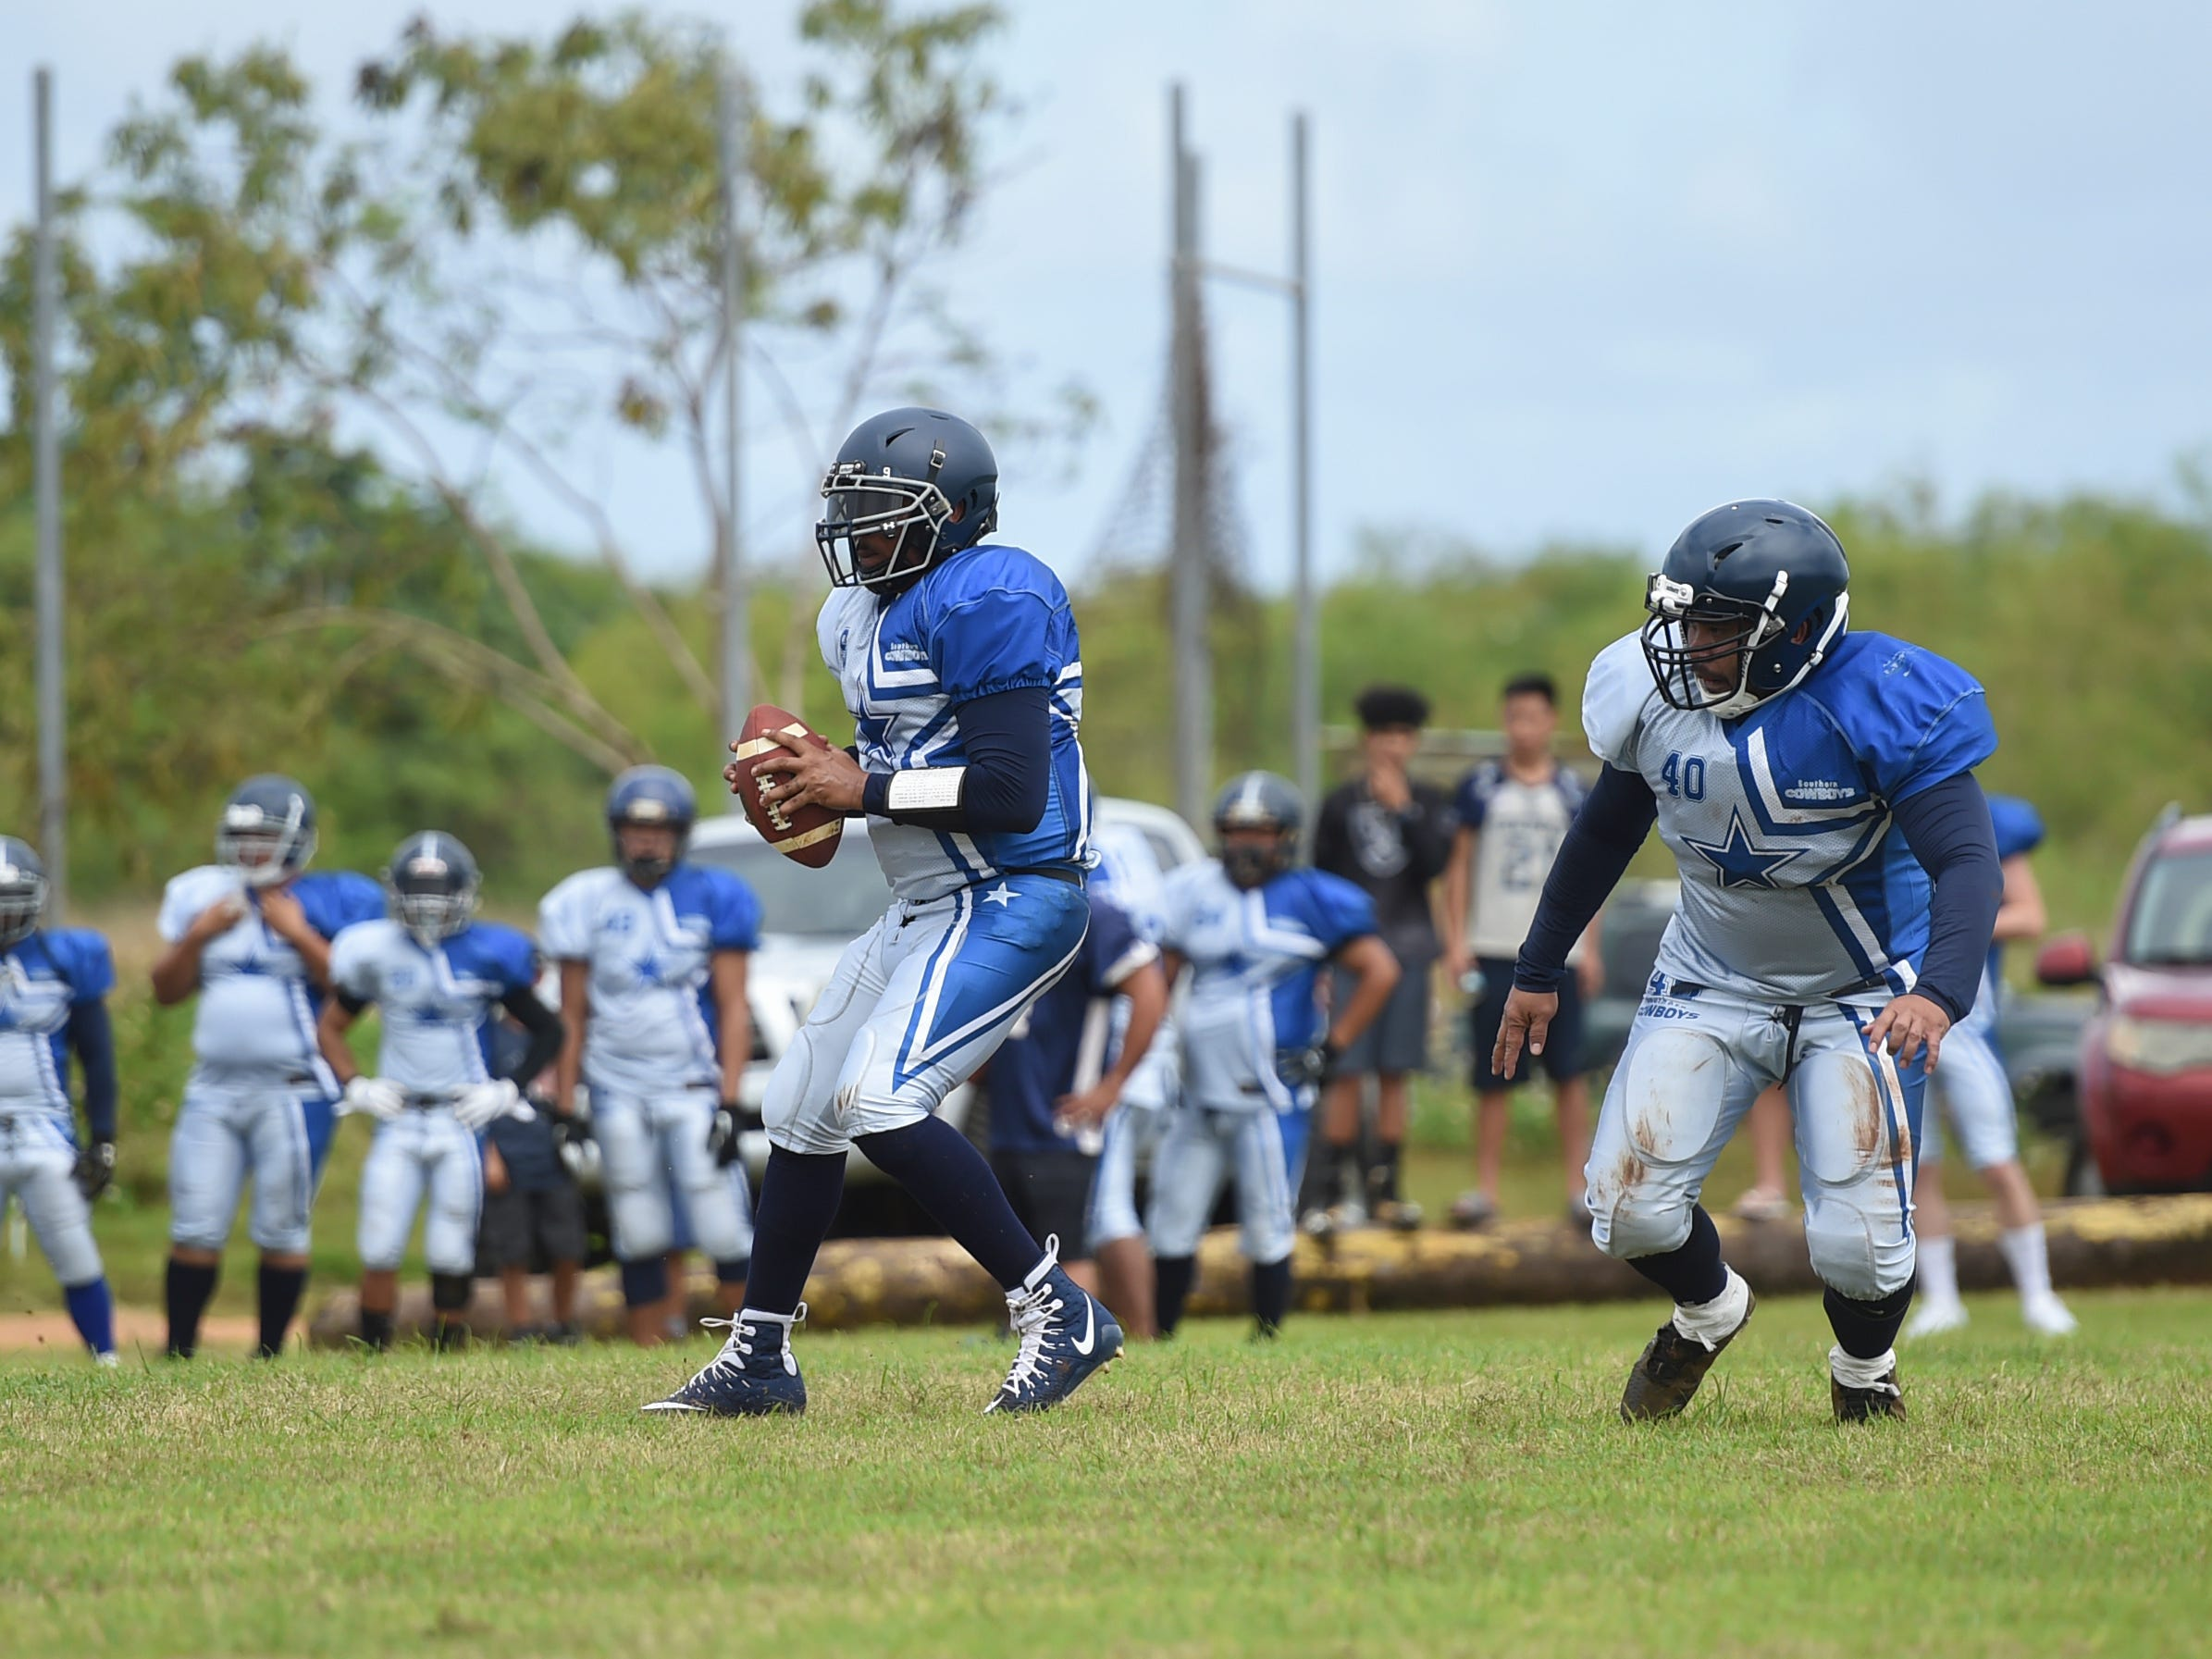 Southern Cowboys quarterback Smokee Hughes looks to make a pass against the Guam Raiders during their Budweiser Guahan Varsity Football League game at Eagles Field in Mangilao, Feb. 2, 2019.